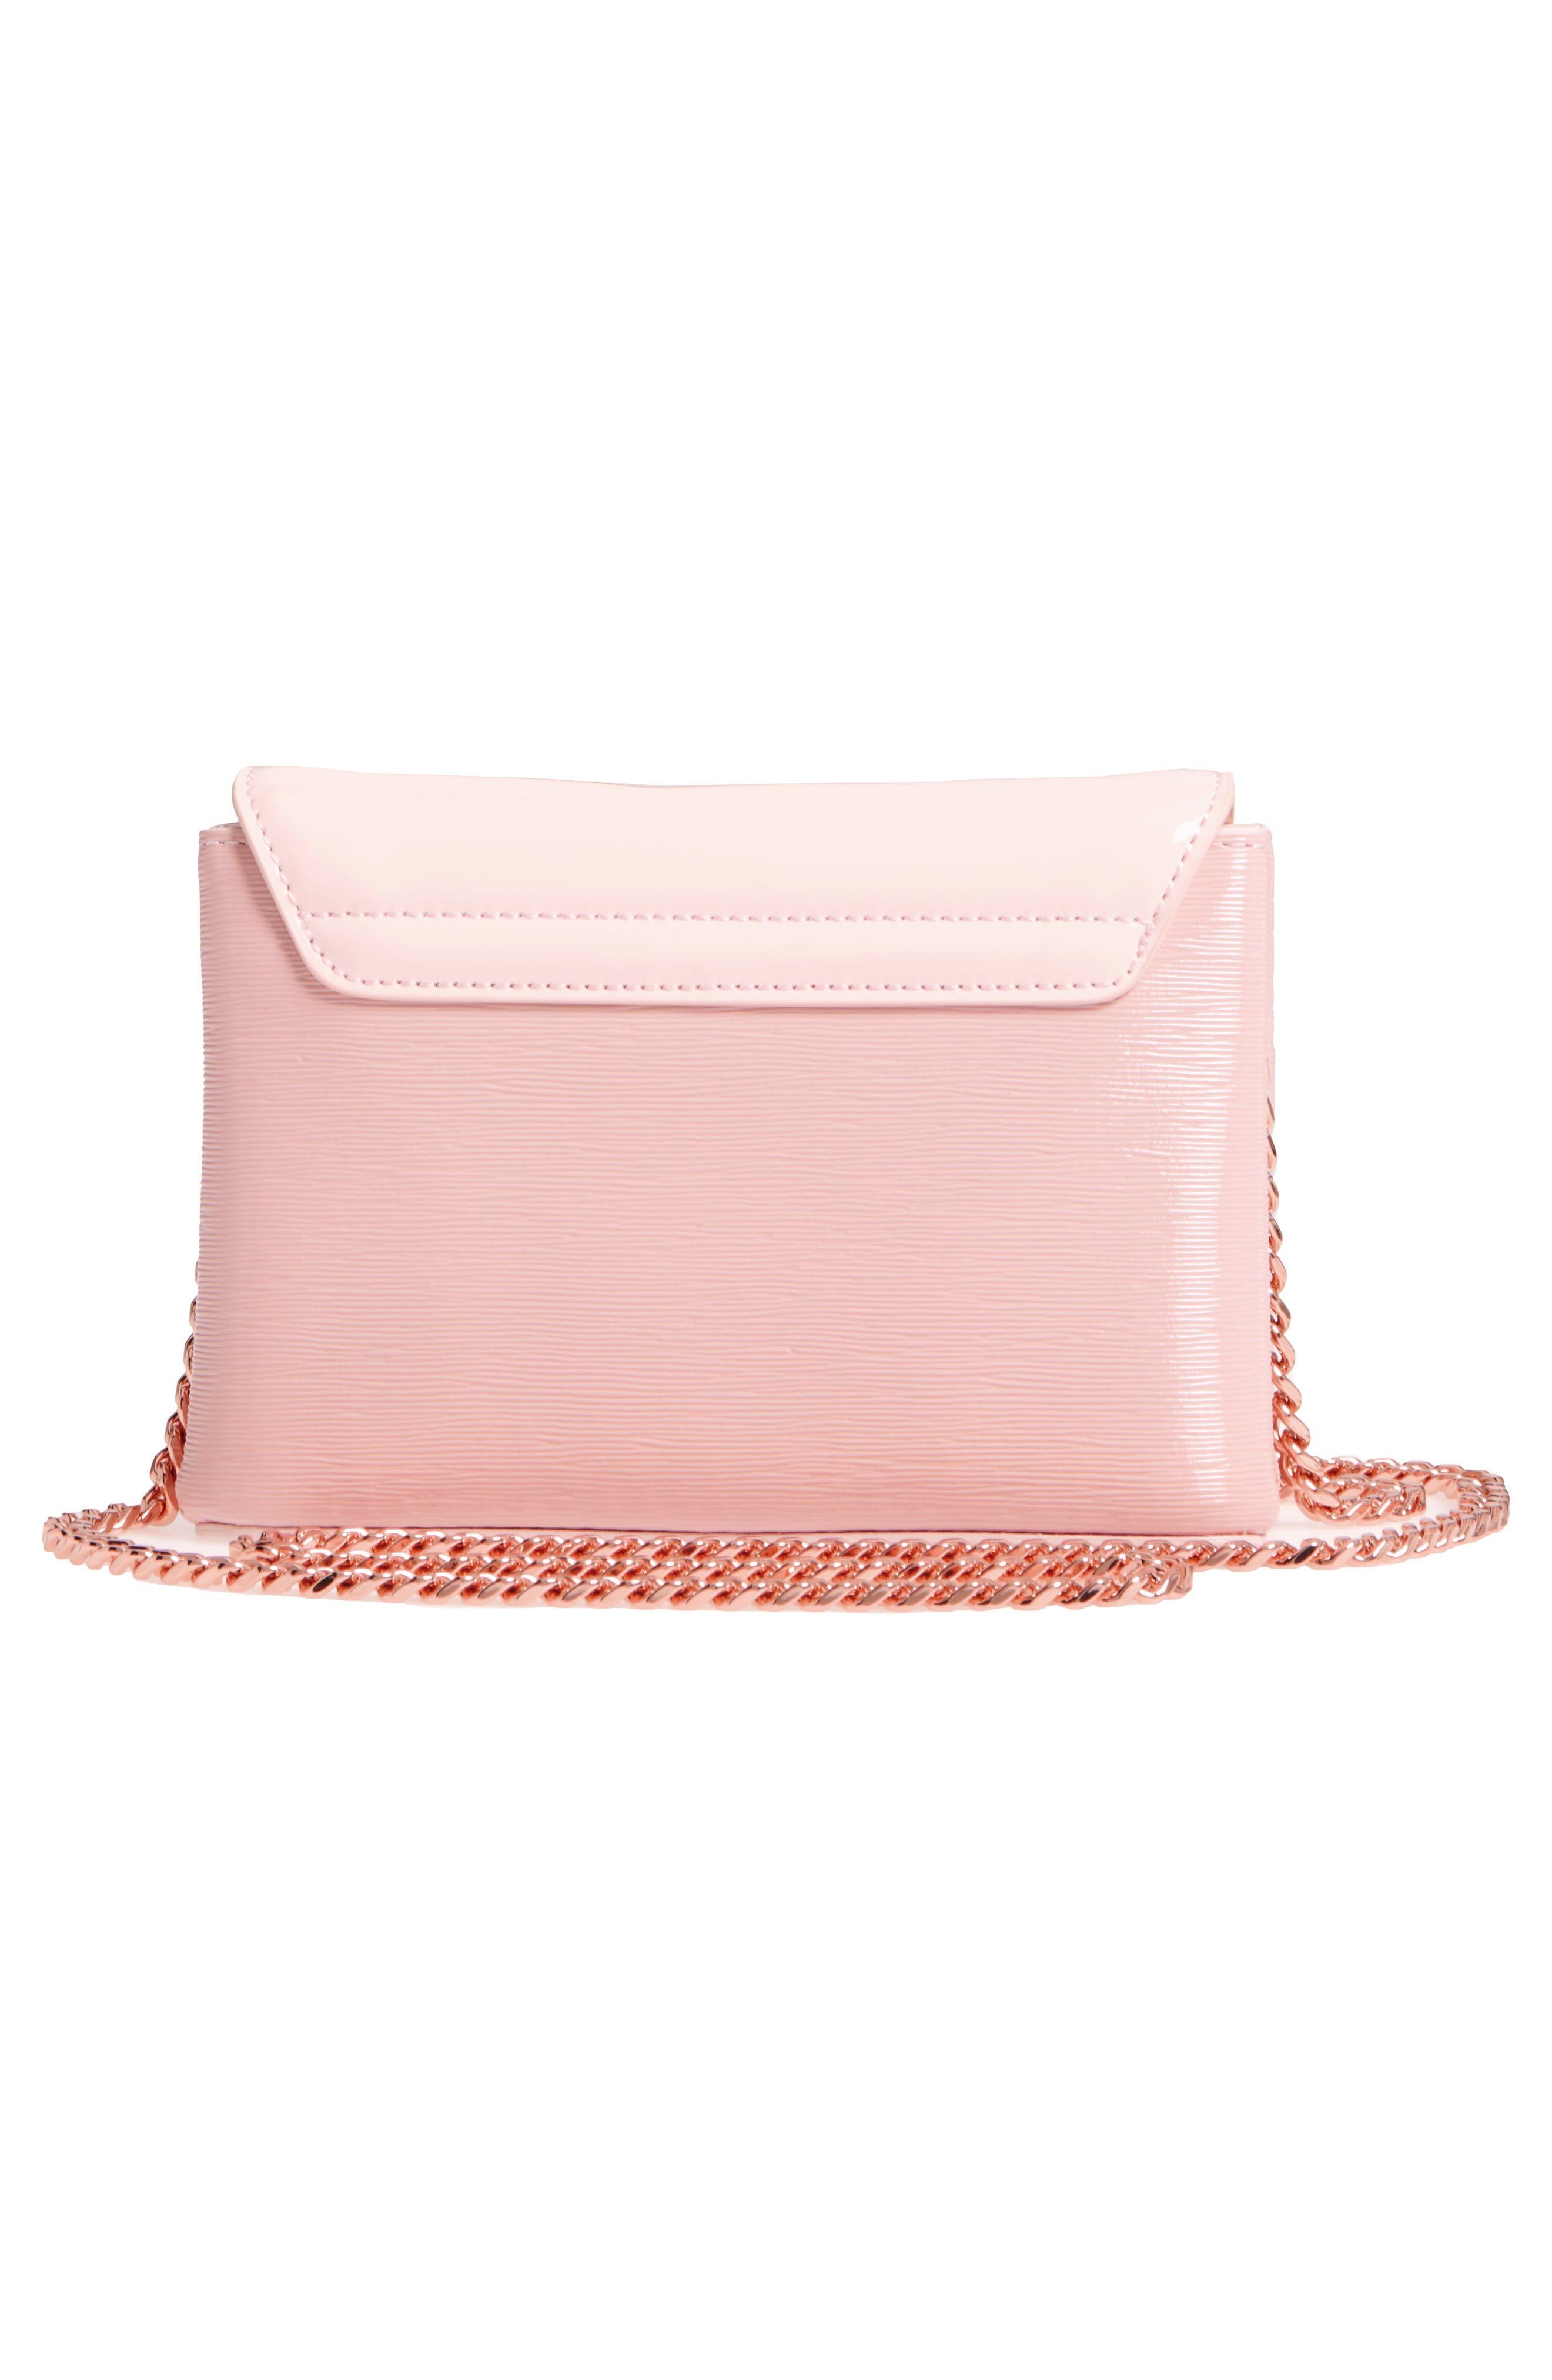 Loopa Bow Mini Leather Crossbody Bag,                             Alternate thumbnail 6, color,